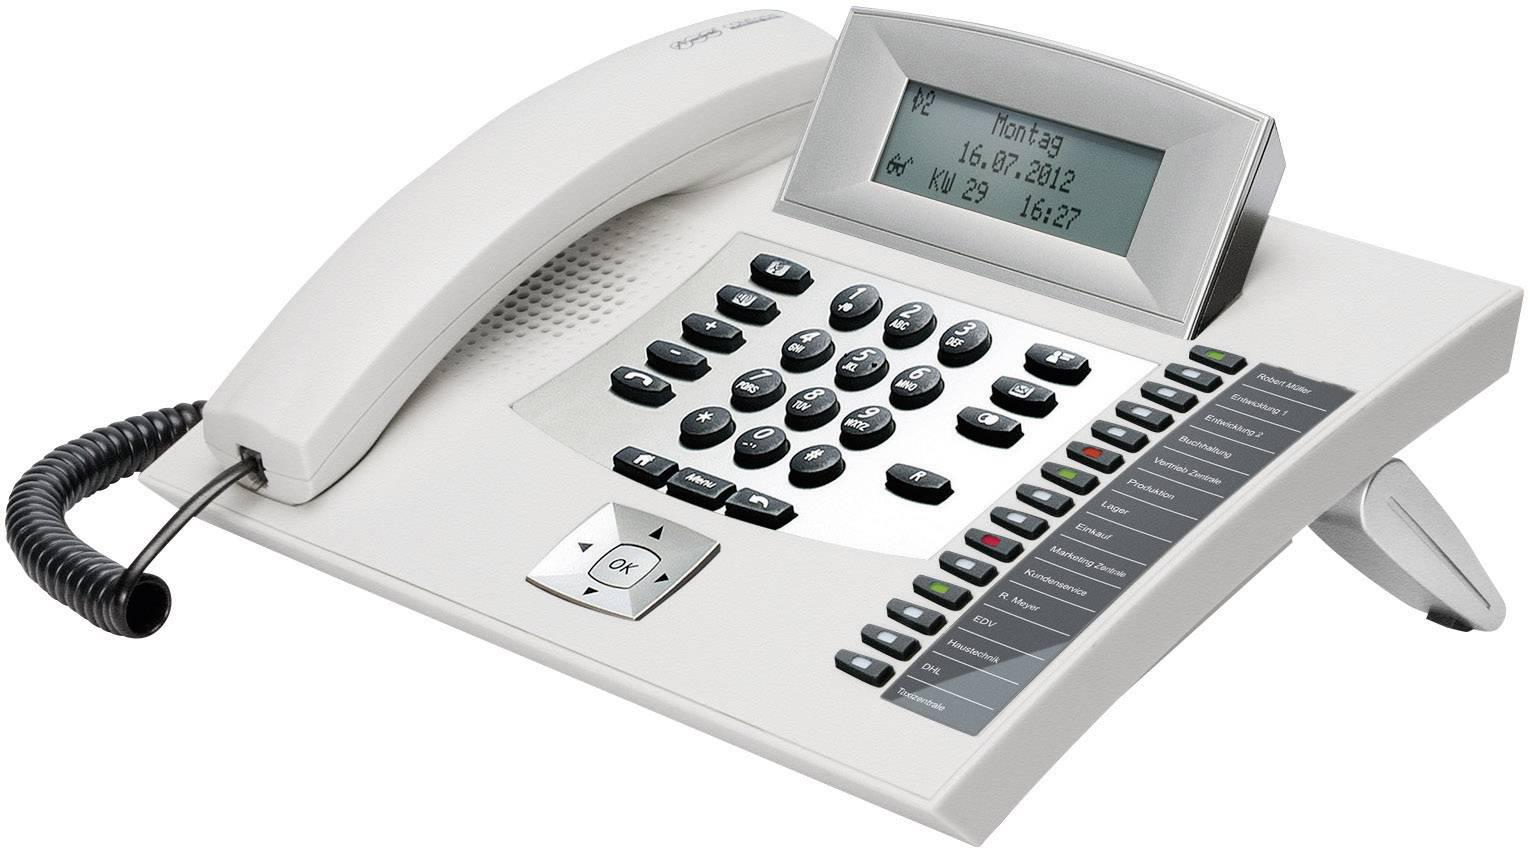 Sistema telefonico ISDN Auersw